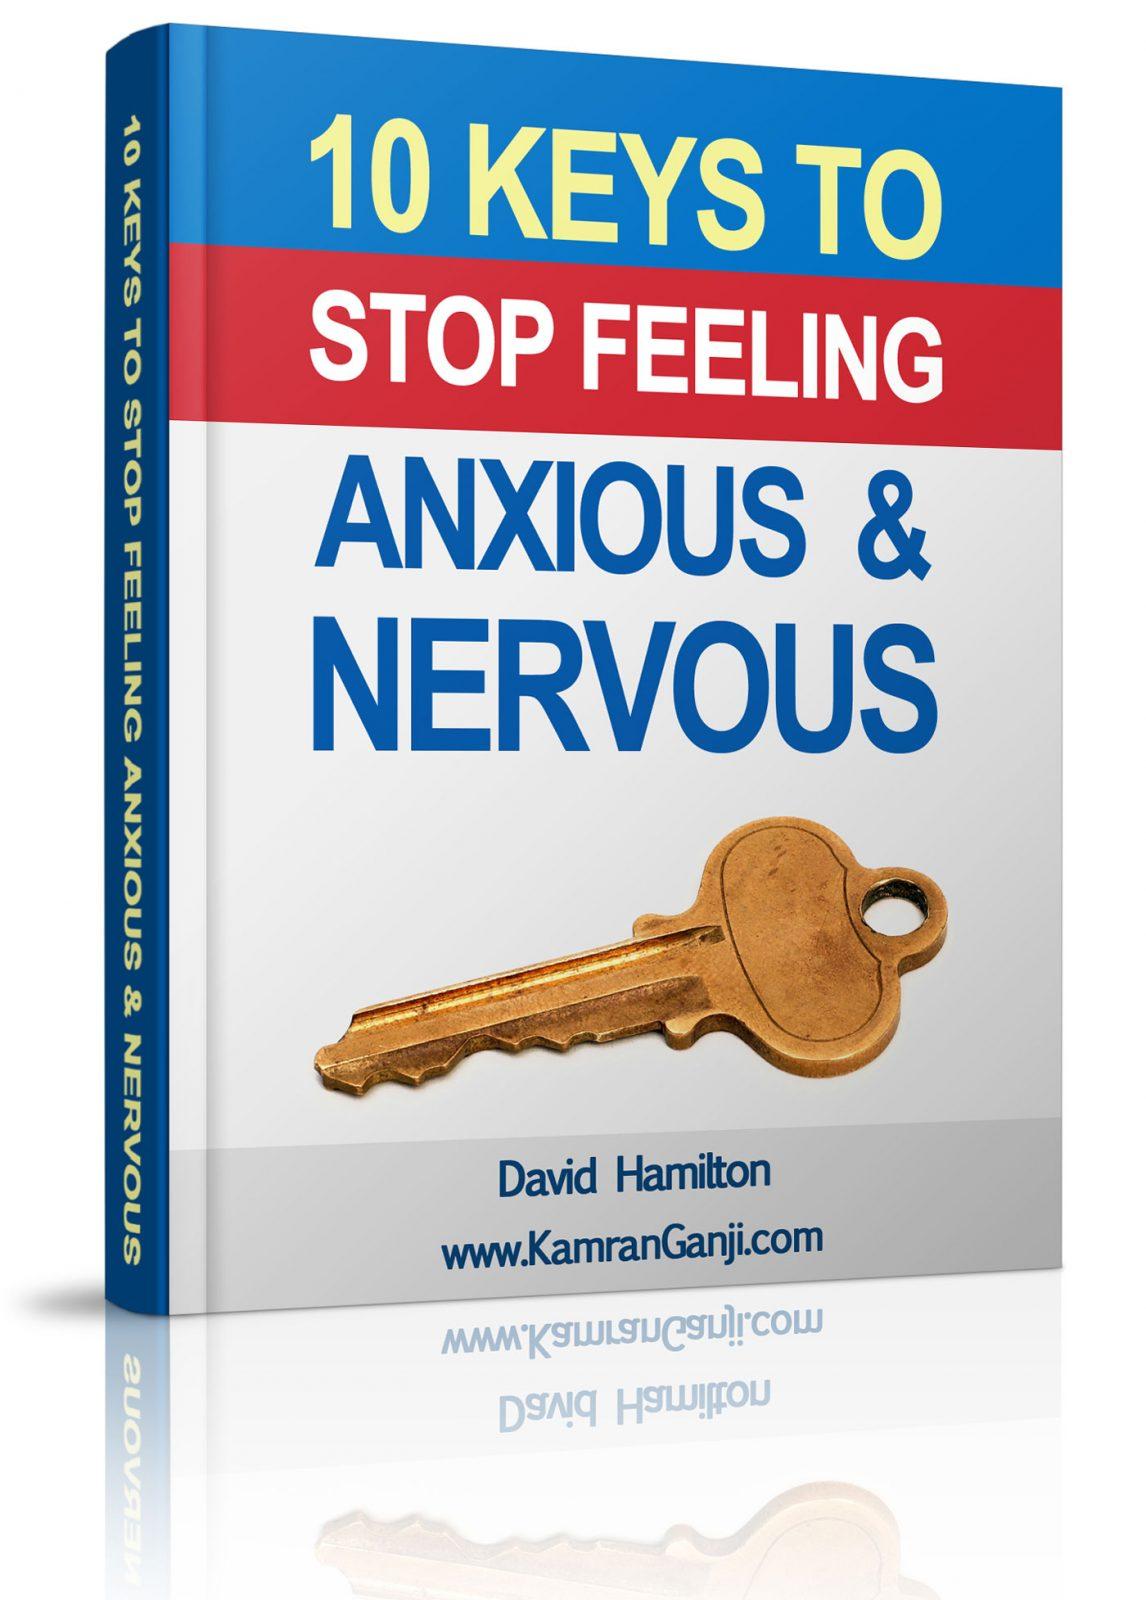 10 Key to Stop Feeling Anxious & Nervous ۱۰ کلید برای جلوگیری از احساس اضطراب و عصبی شدن ۱۰ کلید برای جلوگیری از احساس اضطراب و عصبی شدن 10 Key to Stop Feeling Anxious Nervous